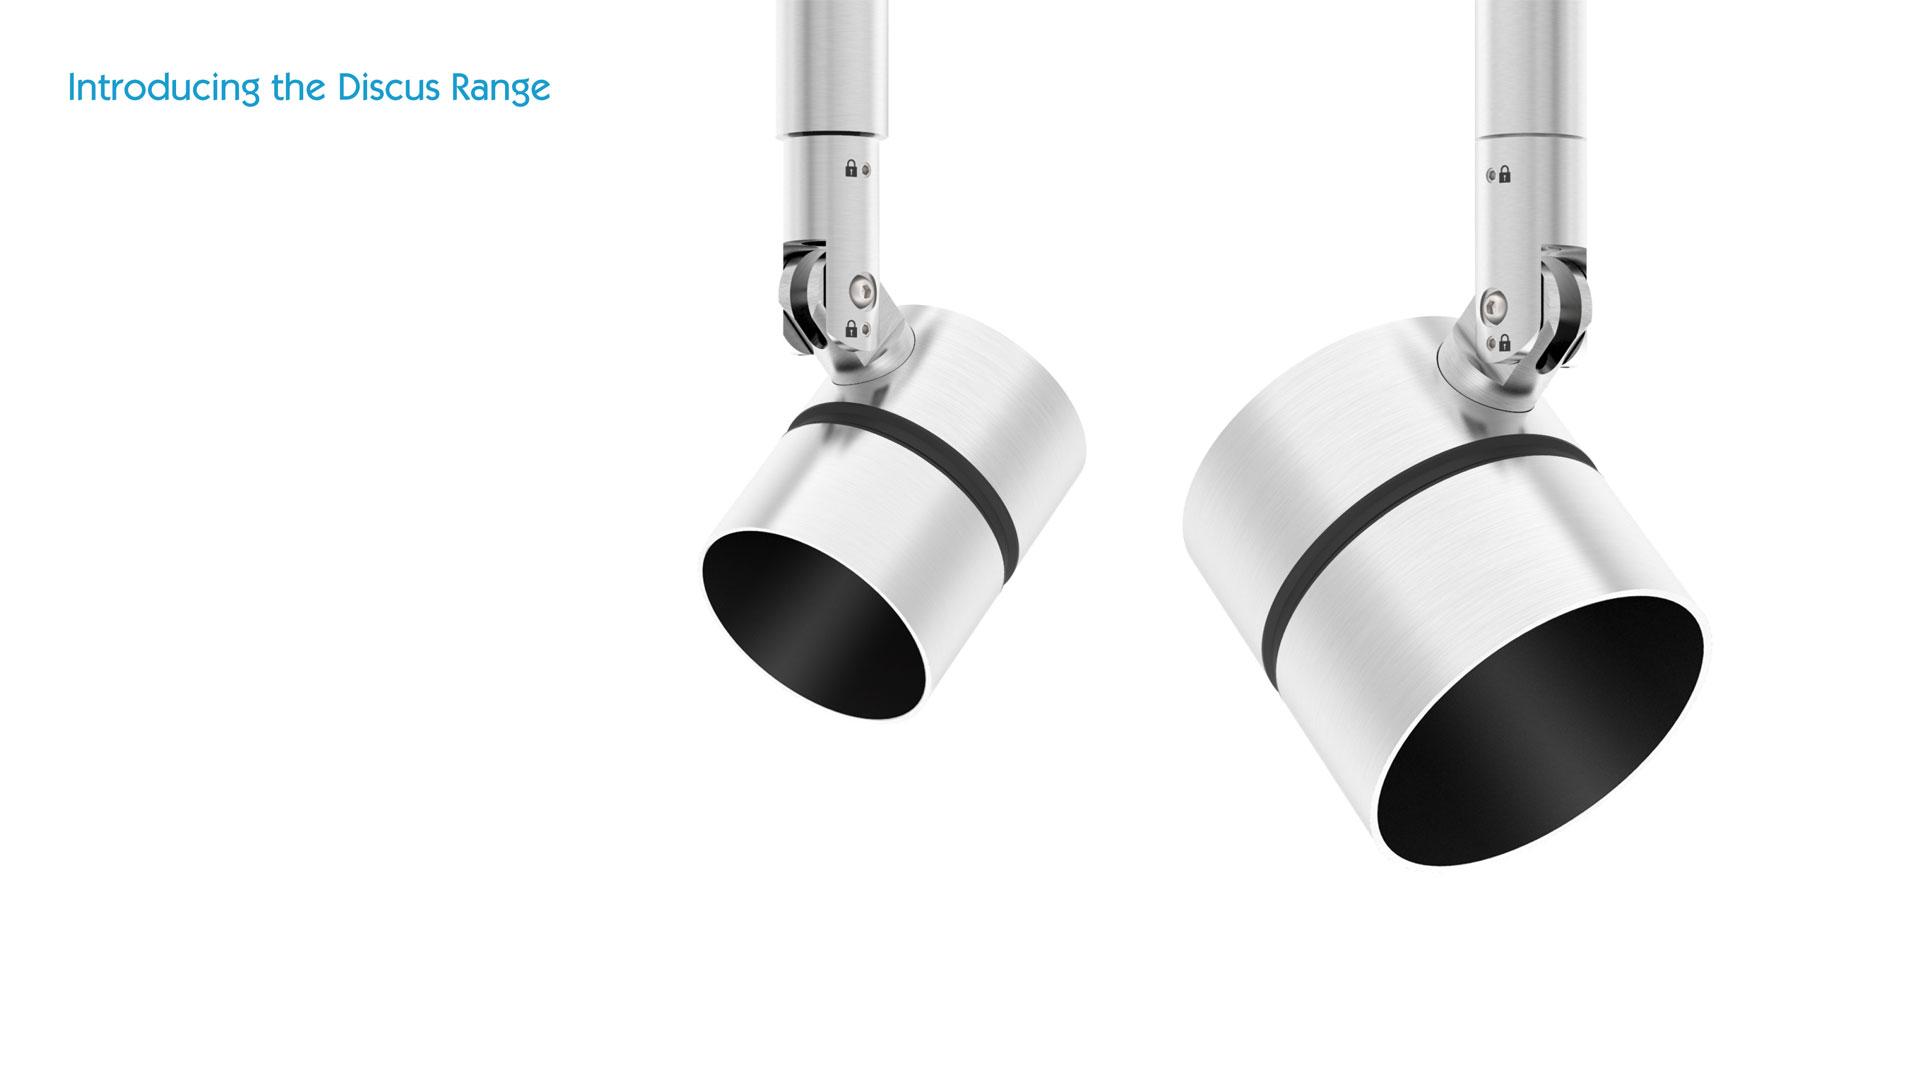 discus-range-1.jpg